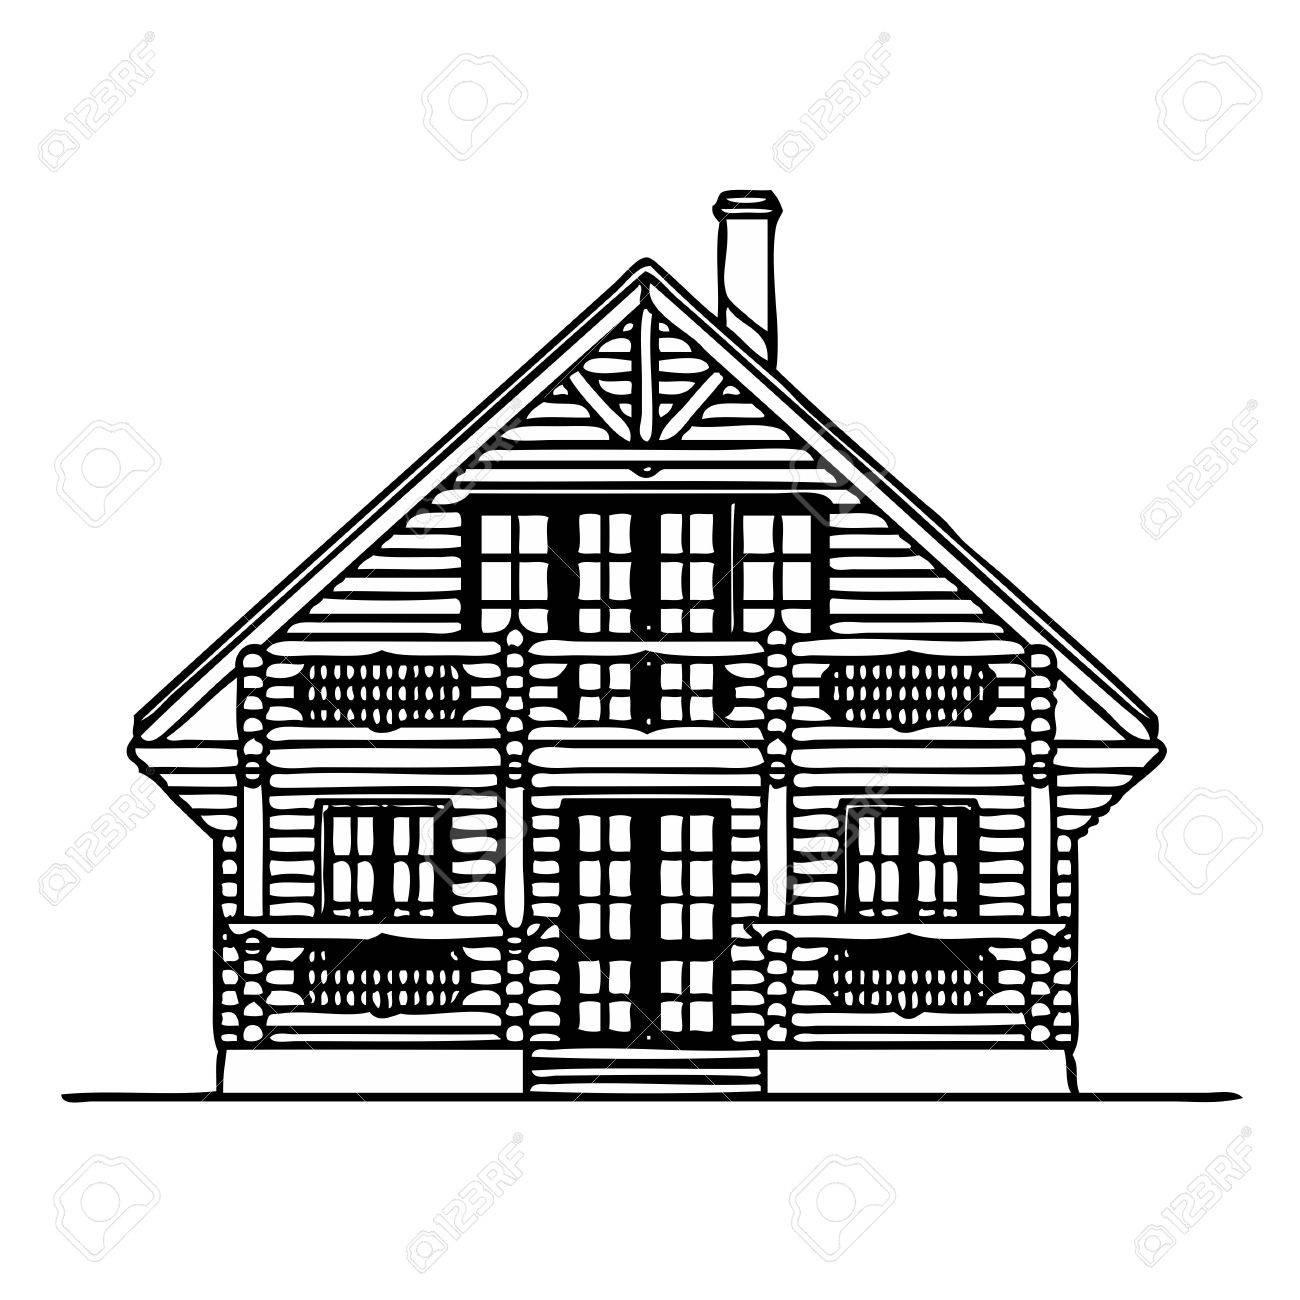 Wooden house Stock Vector - 13767453